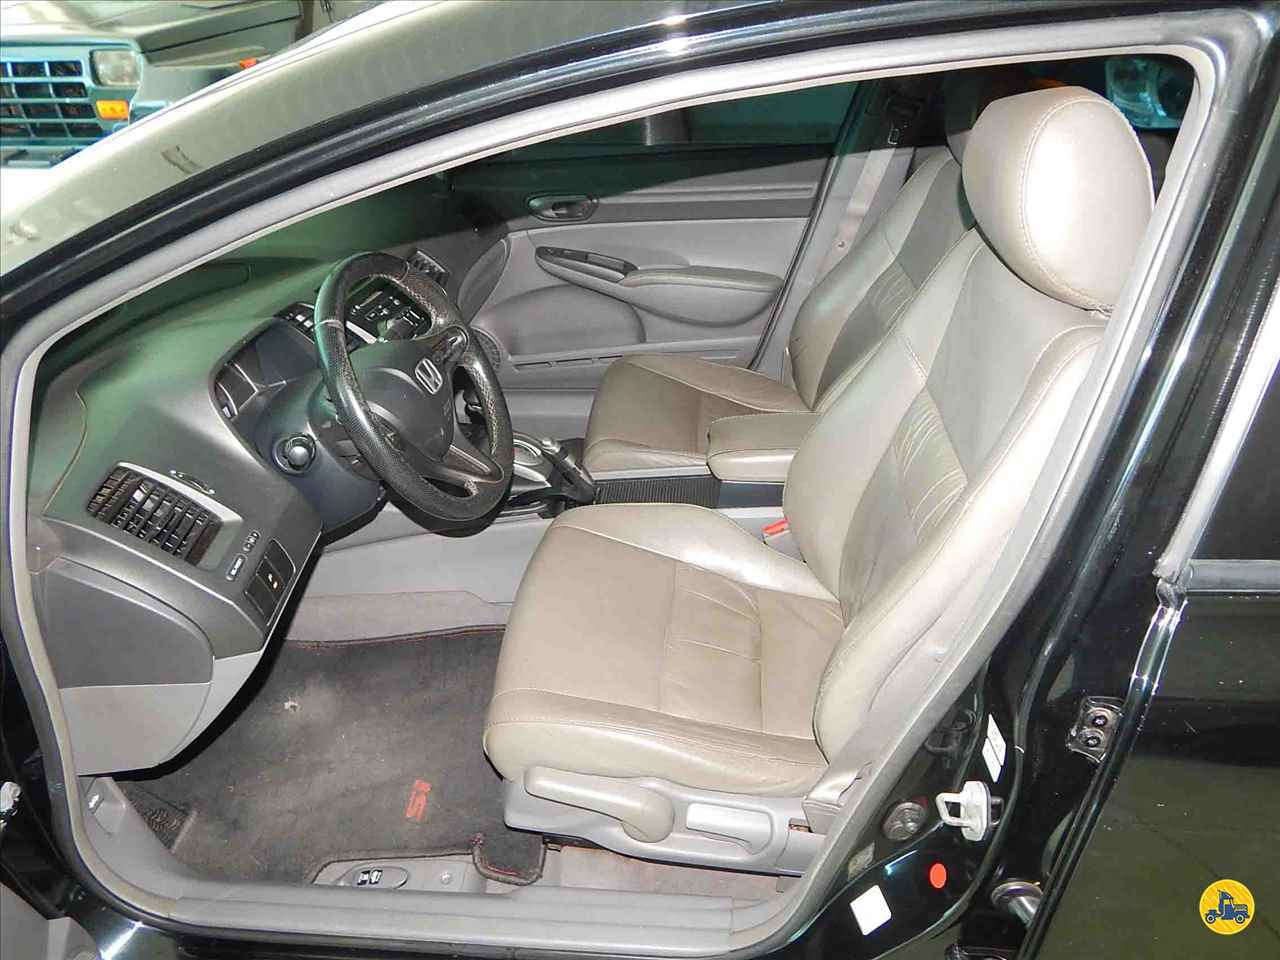 HONDA Civic Sedan 1.8 LXS 122000km 2008/2008 Guirro Automóveis Multimarcas